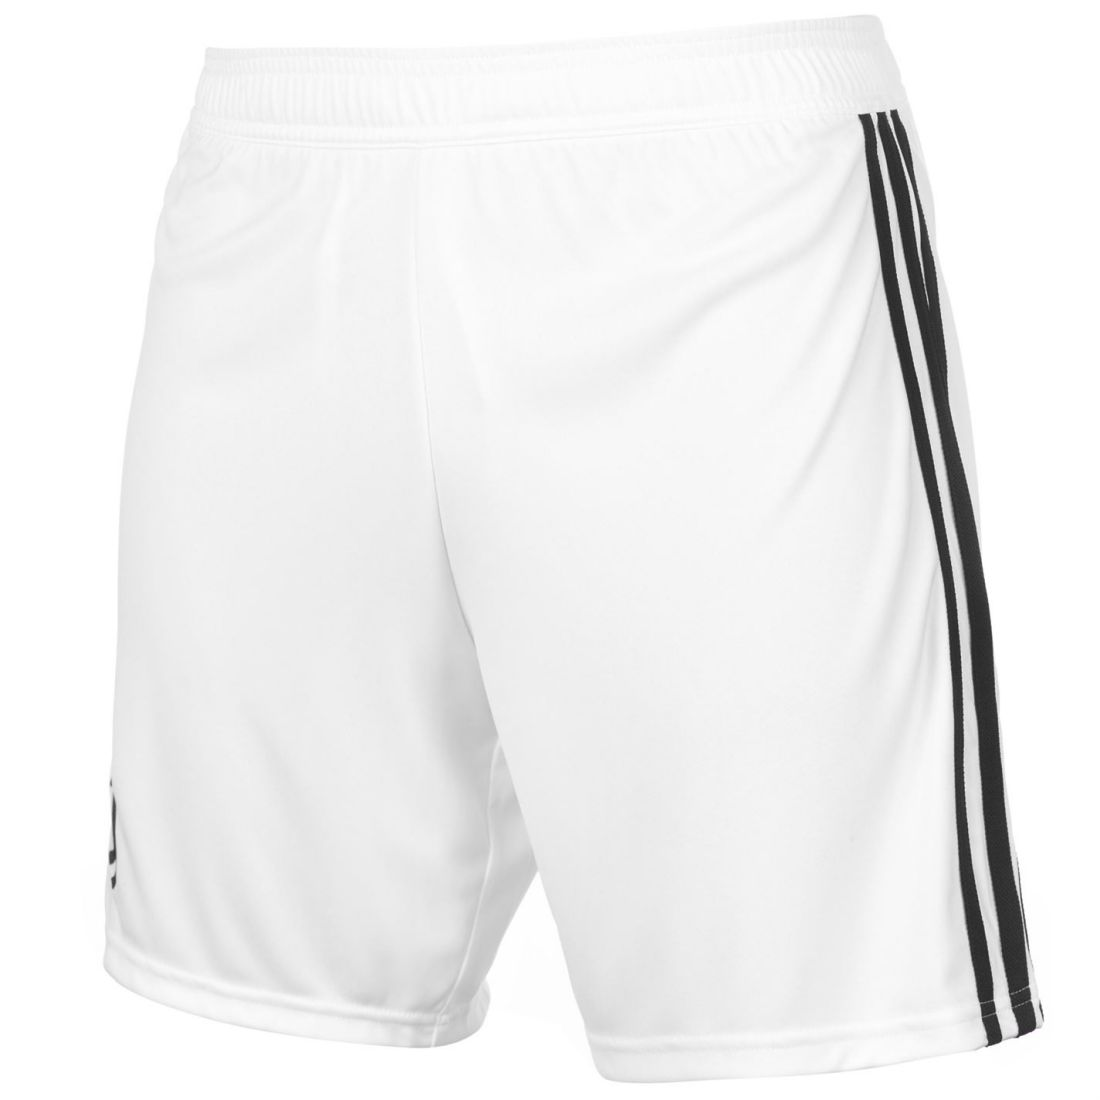 d745c4b48 adidas Mens Juventus Home Shorts 2018 2019 Domestic Pants Trousers Bottoms